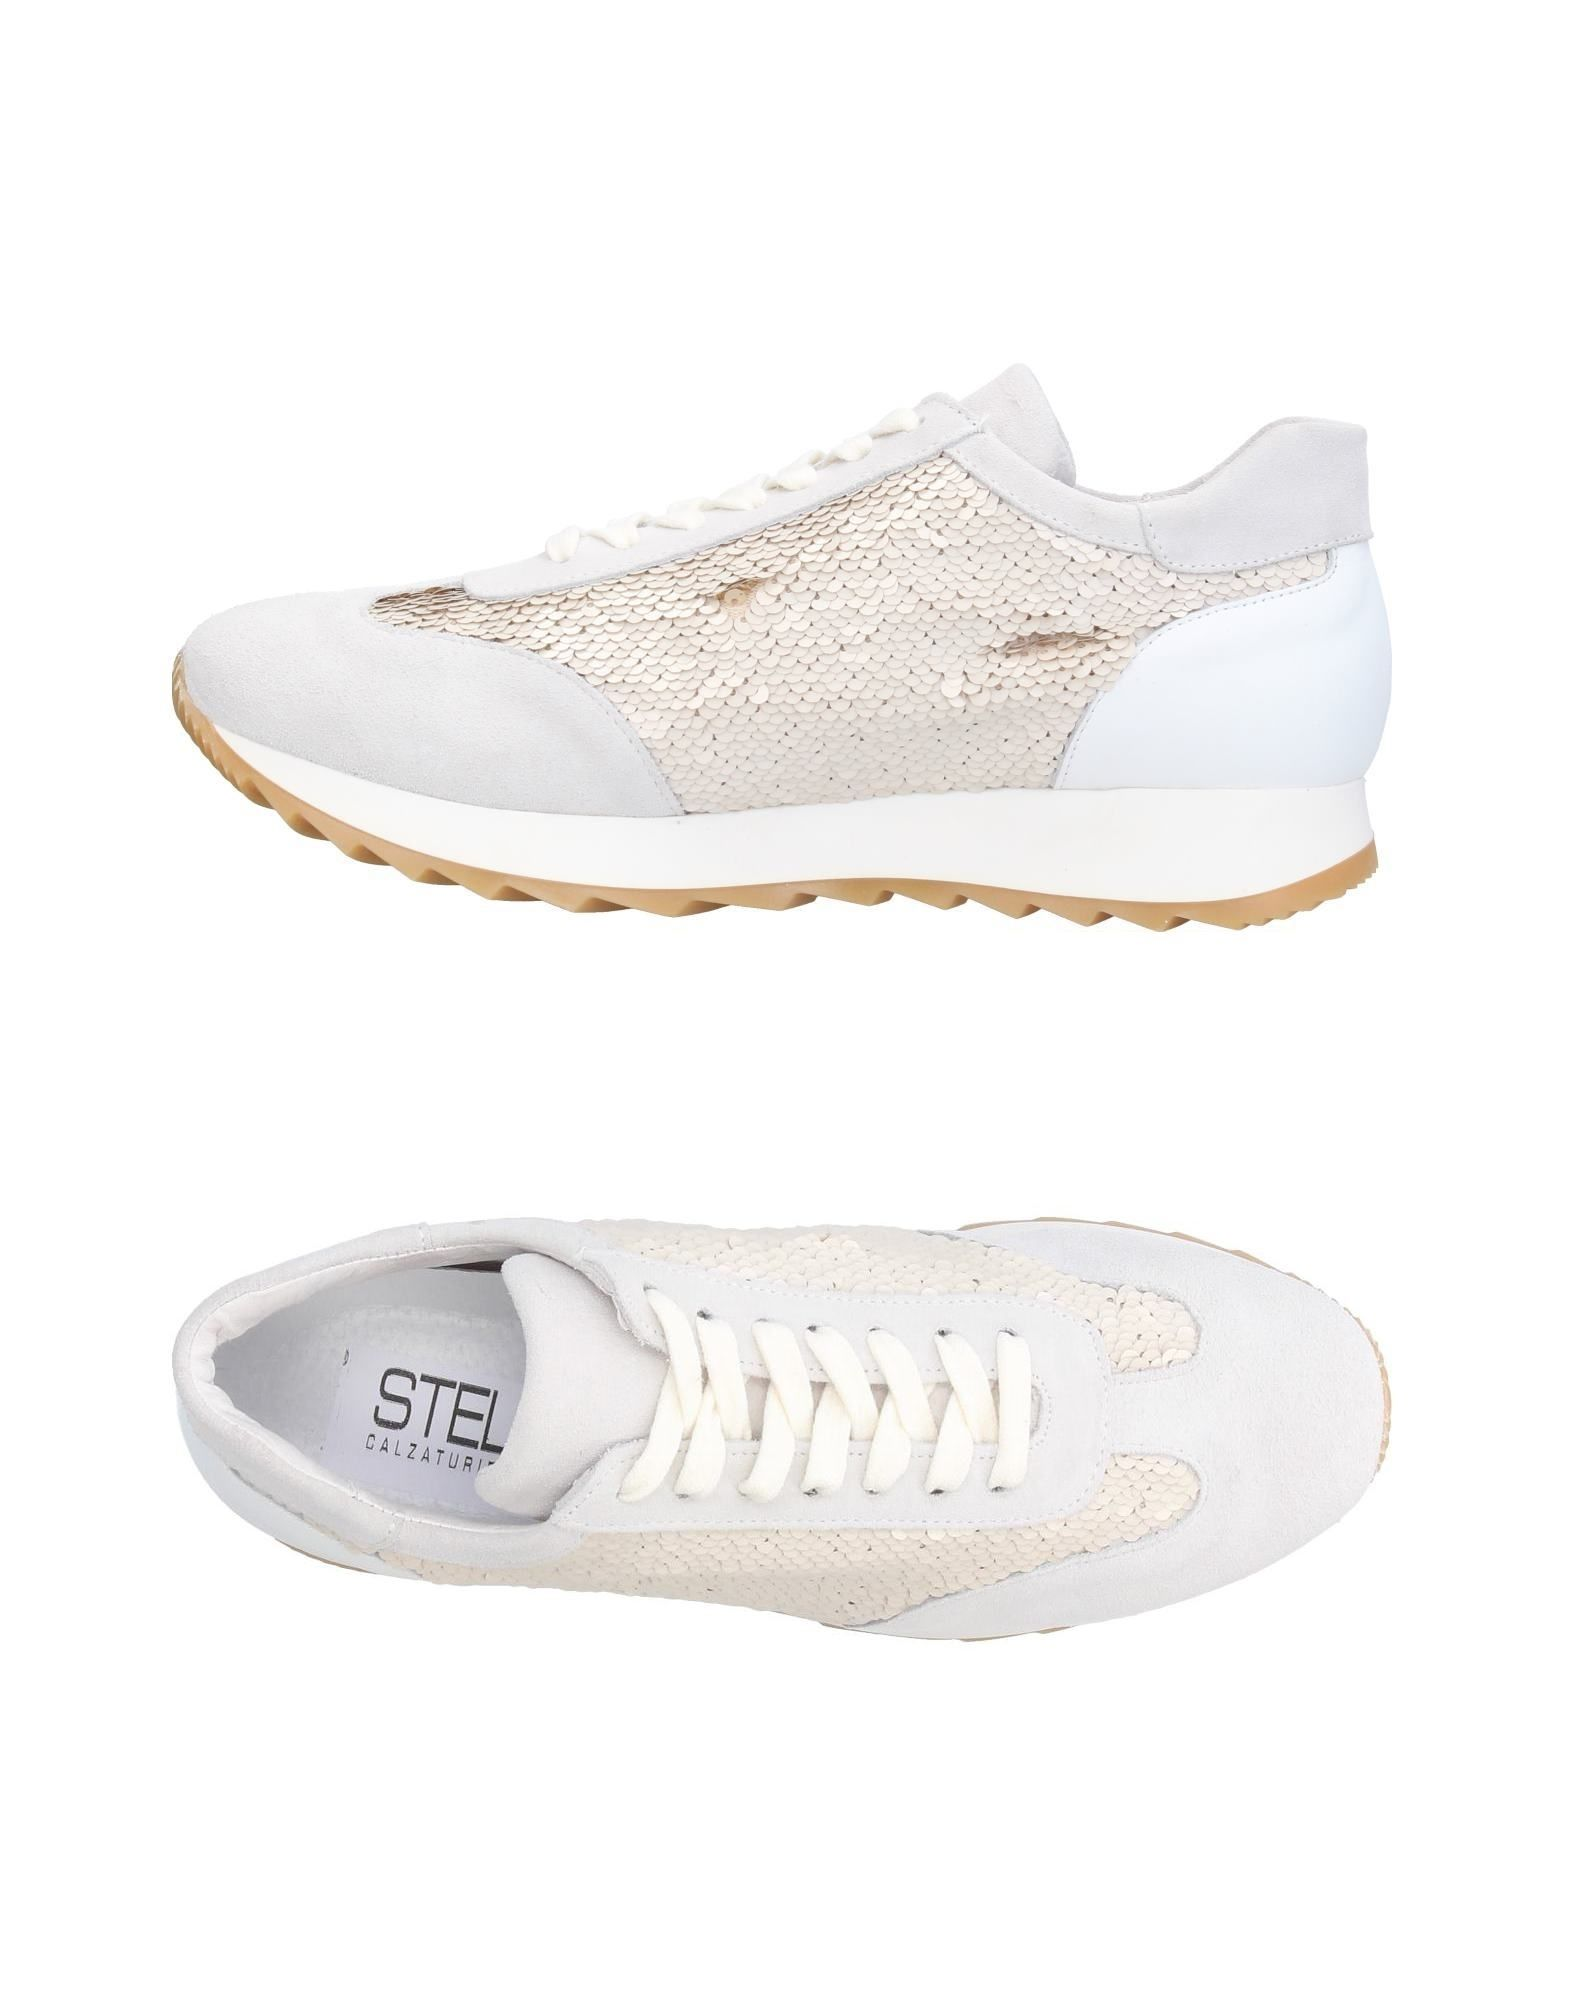 Stele Sneakers Damen  11376547EA Gute Qualität beliebte Schuhe